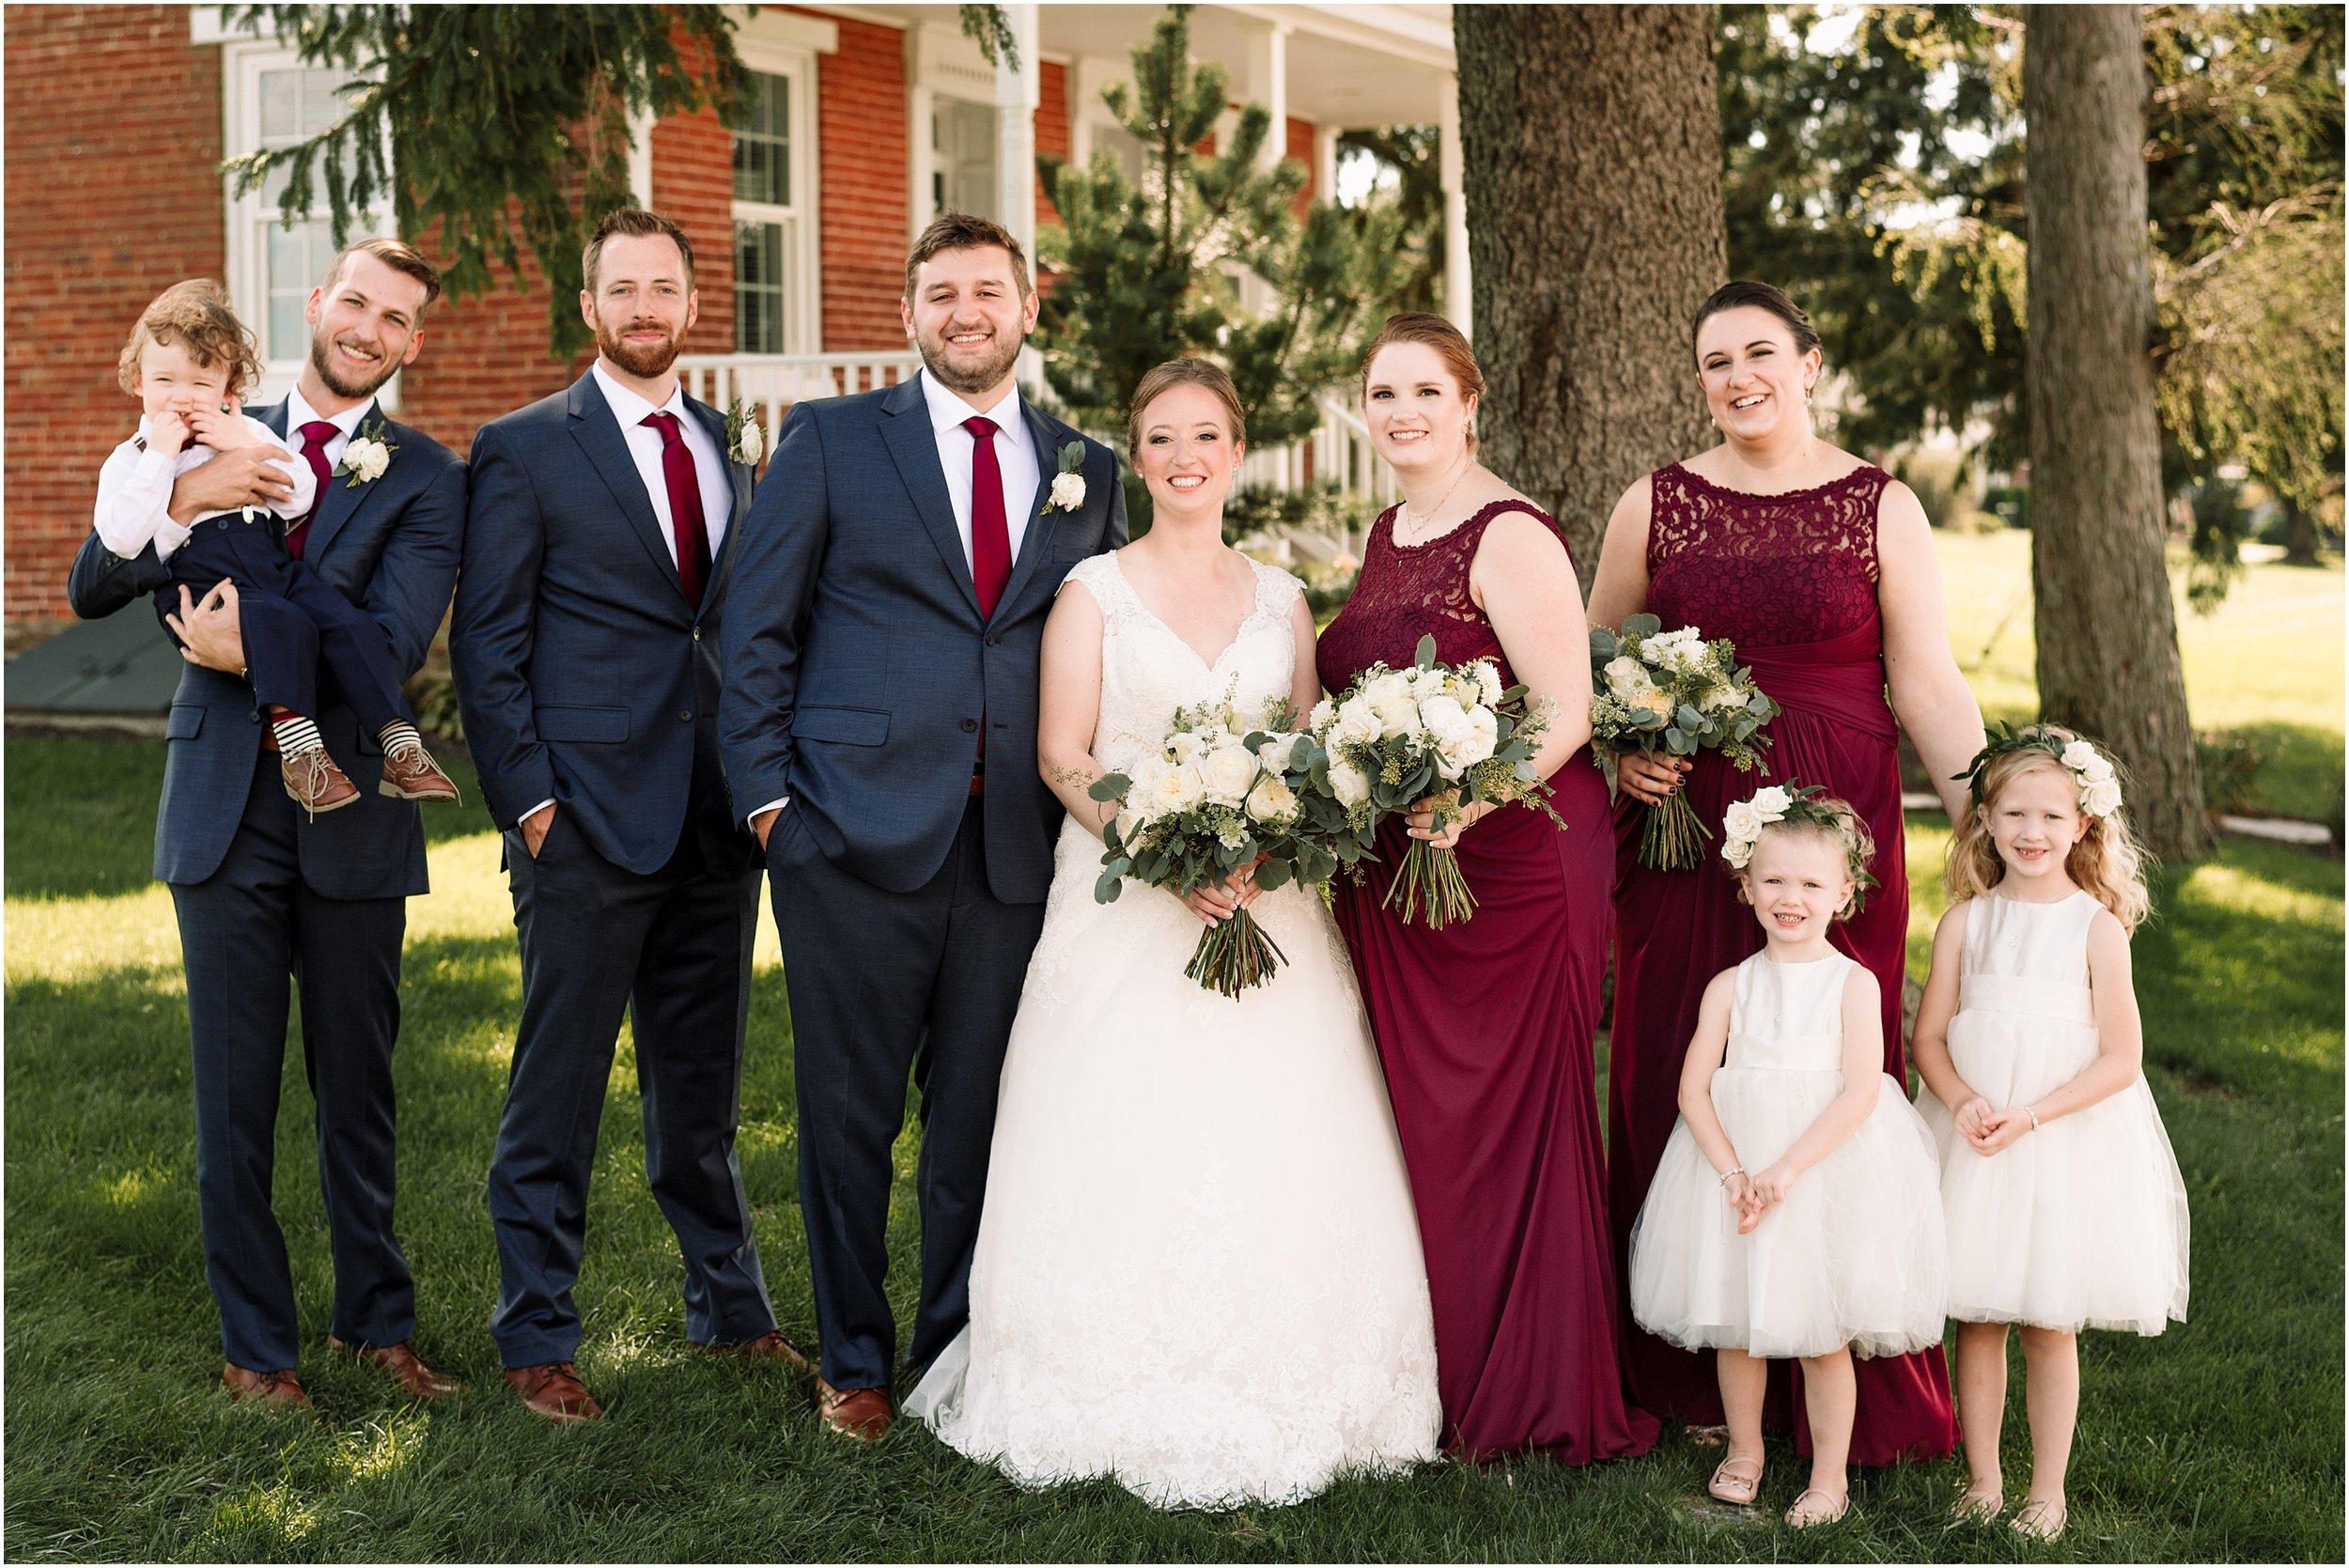 hannah leigh photography Wyndridge Farm Wedding York PA_1514.jpg